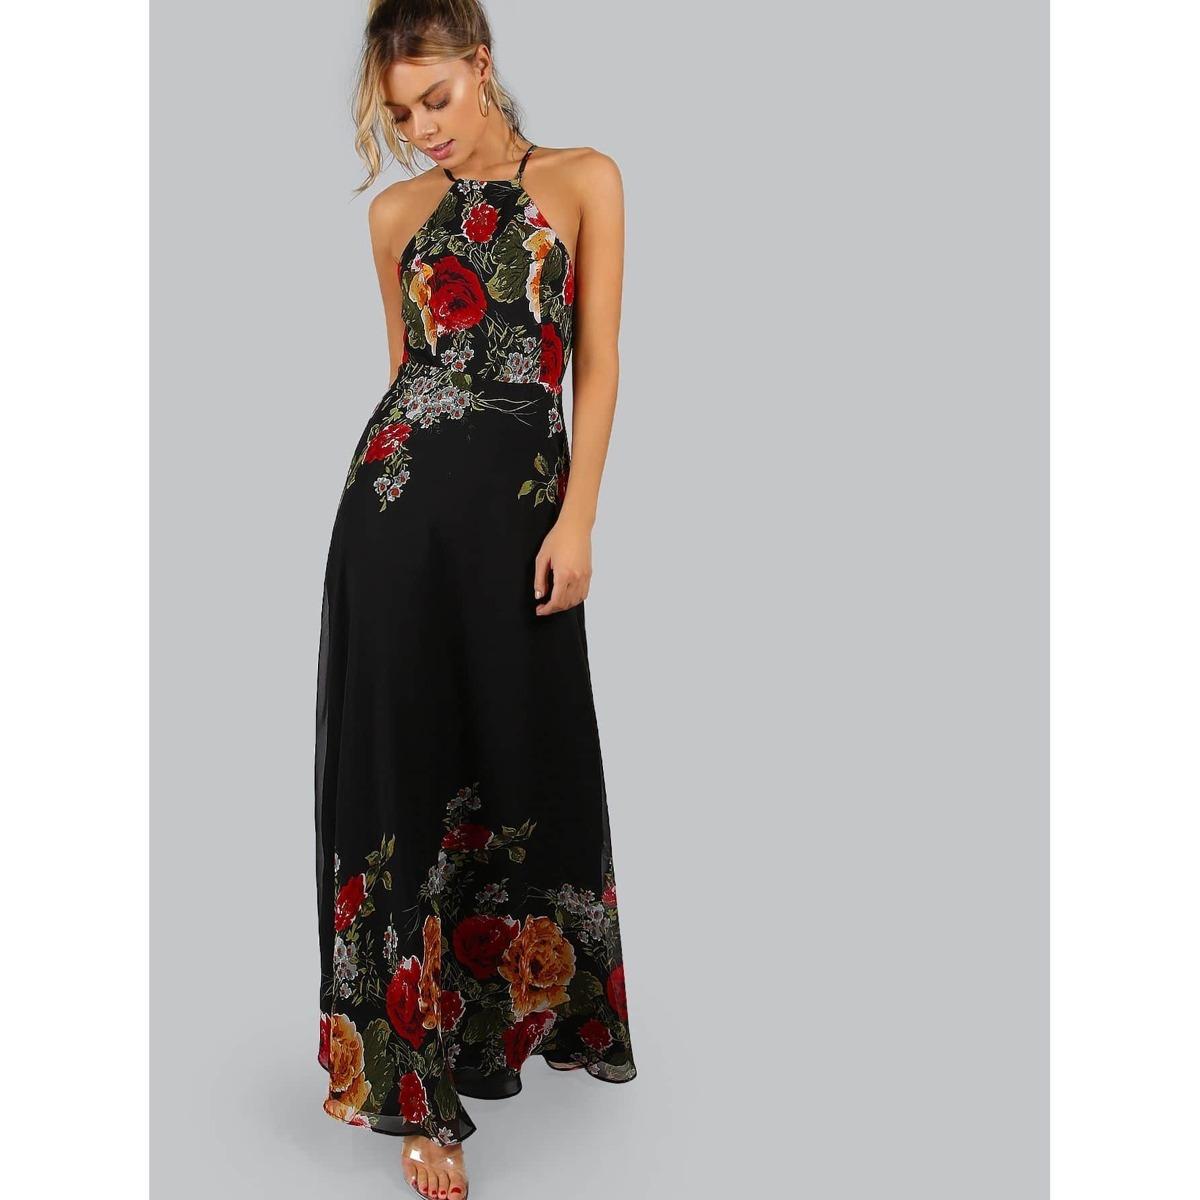 Black Flower Print Halter Neck Open Back Maxi Dress